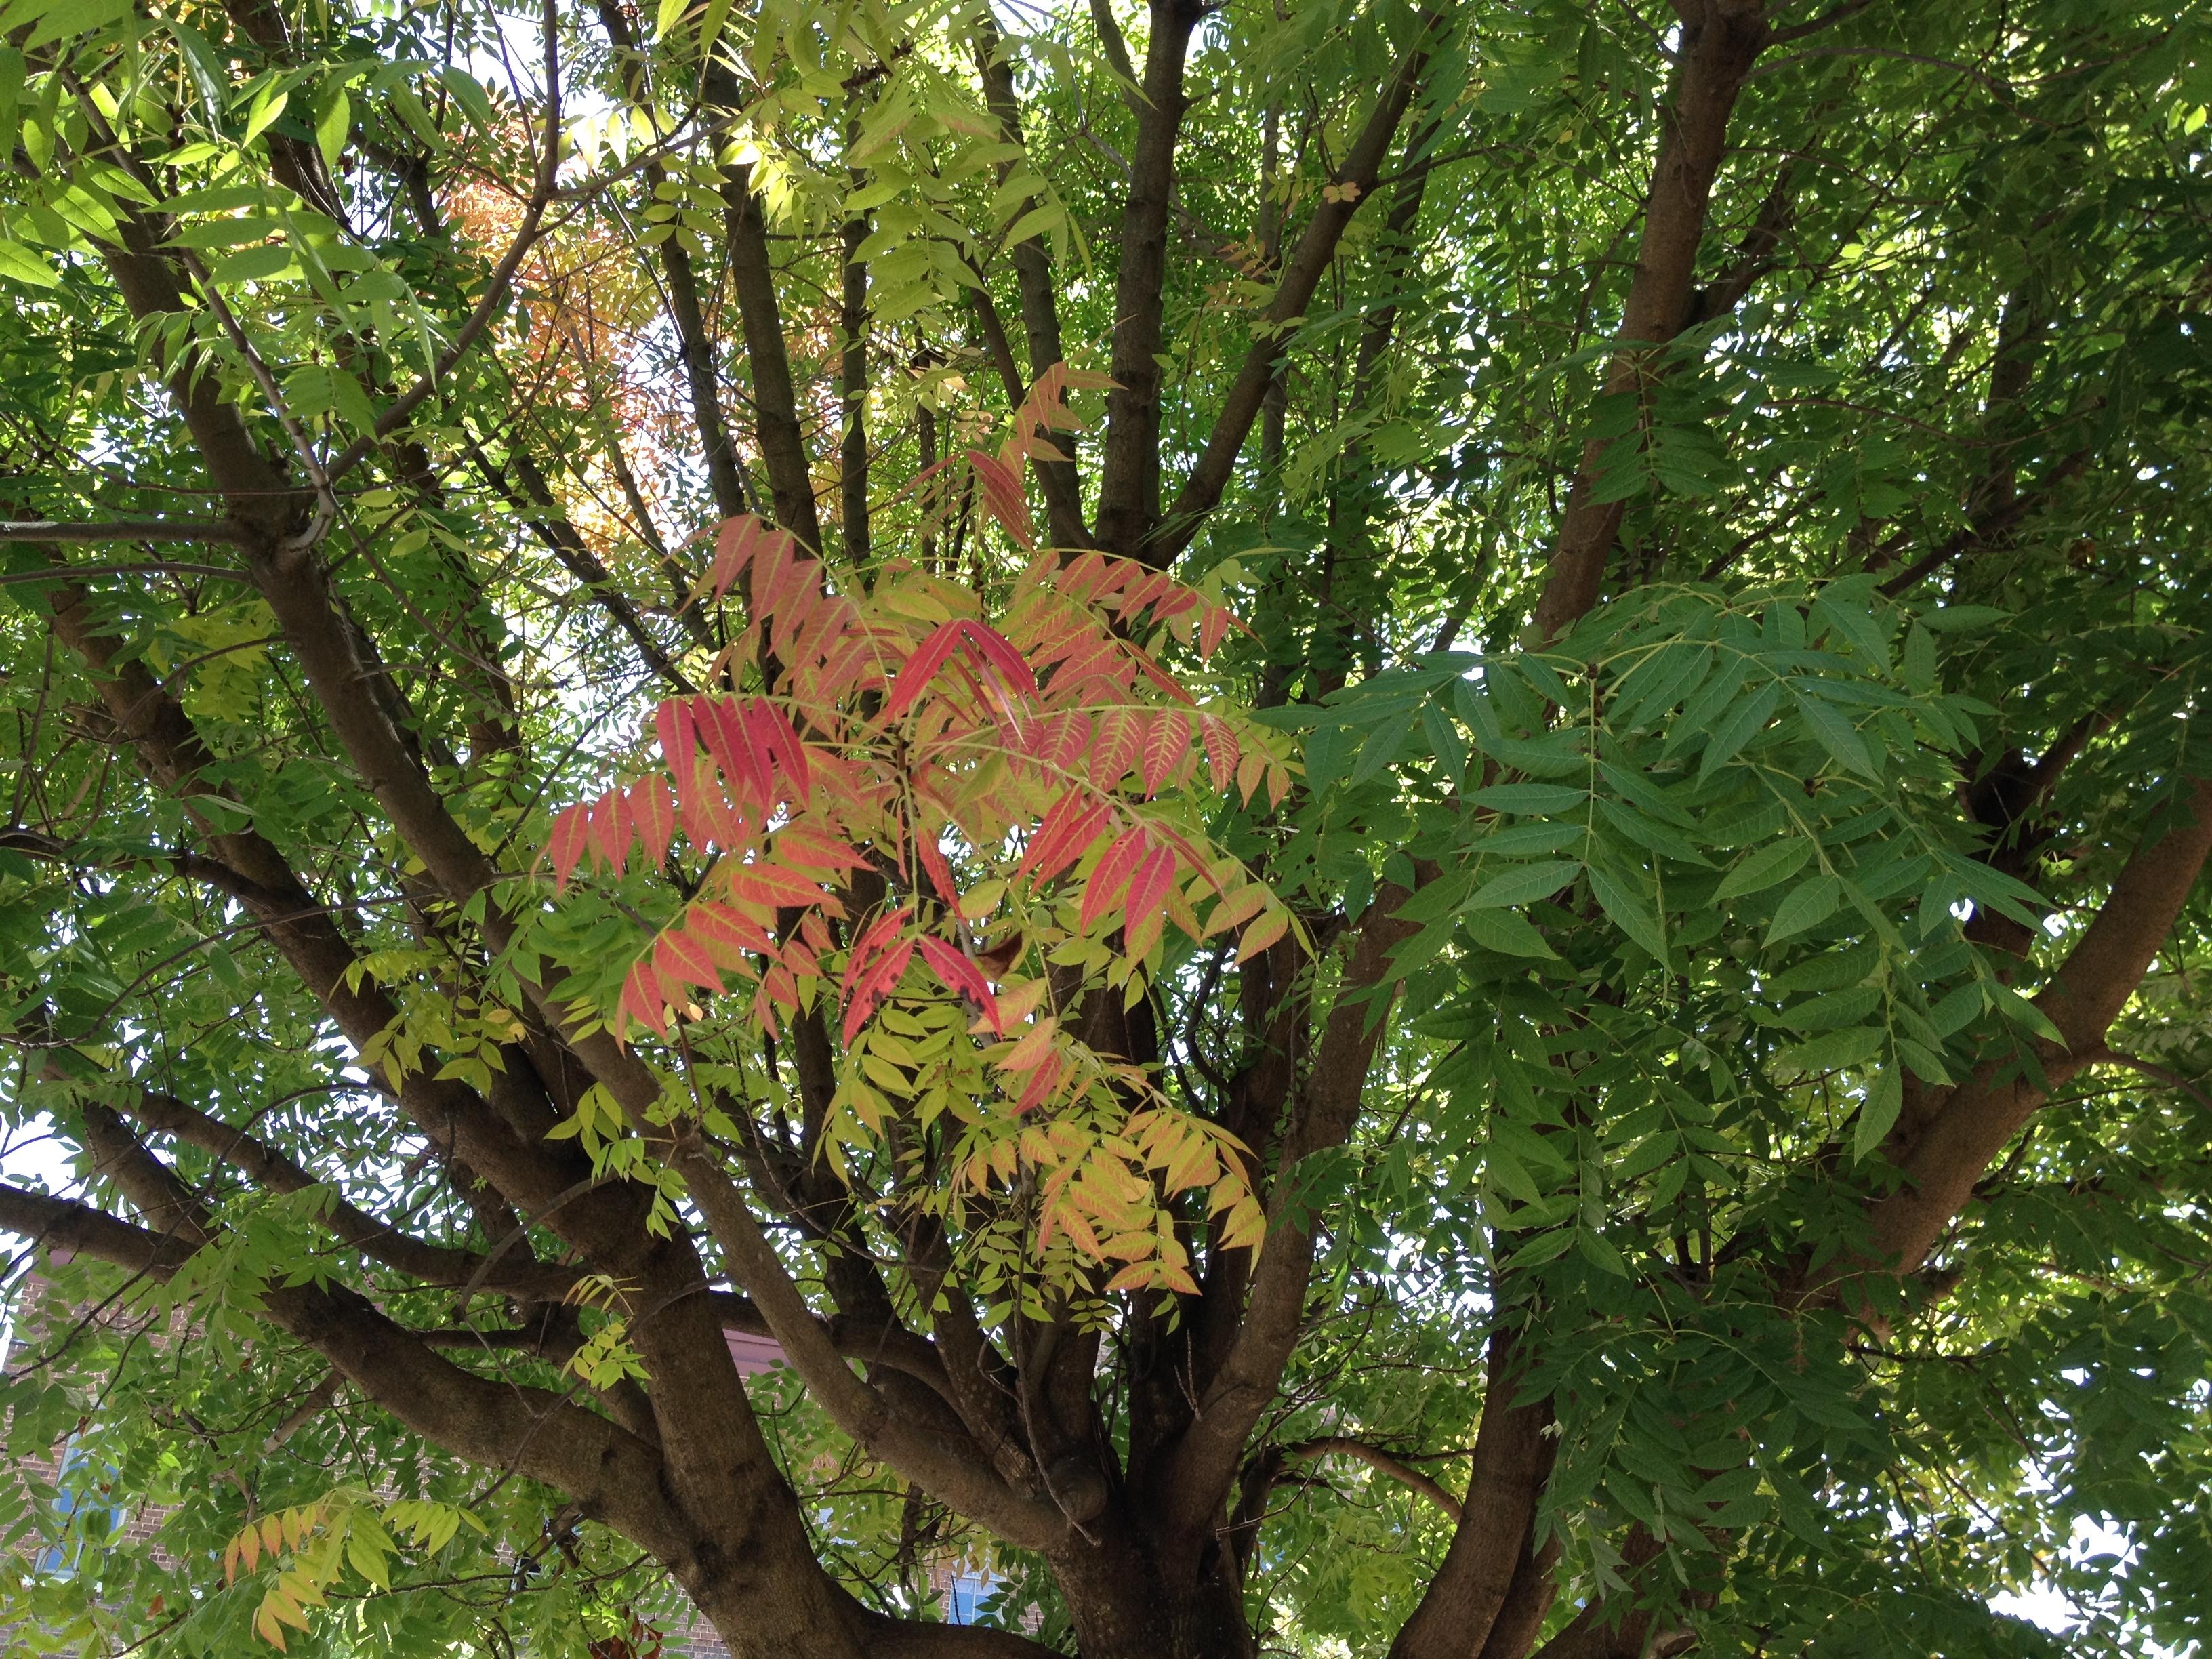 fall, harvest, foliage, Stephen King, Halloween, horror, pumpkin, fall in Birmingham